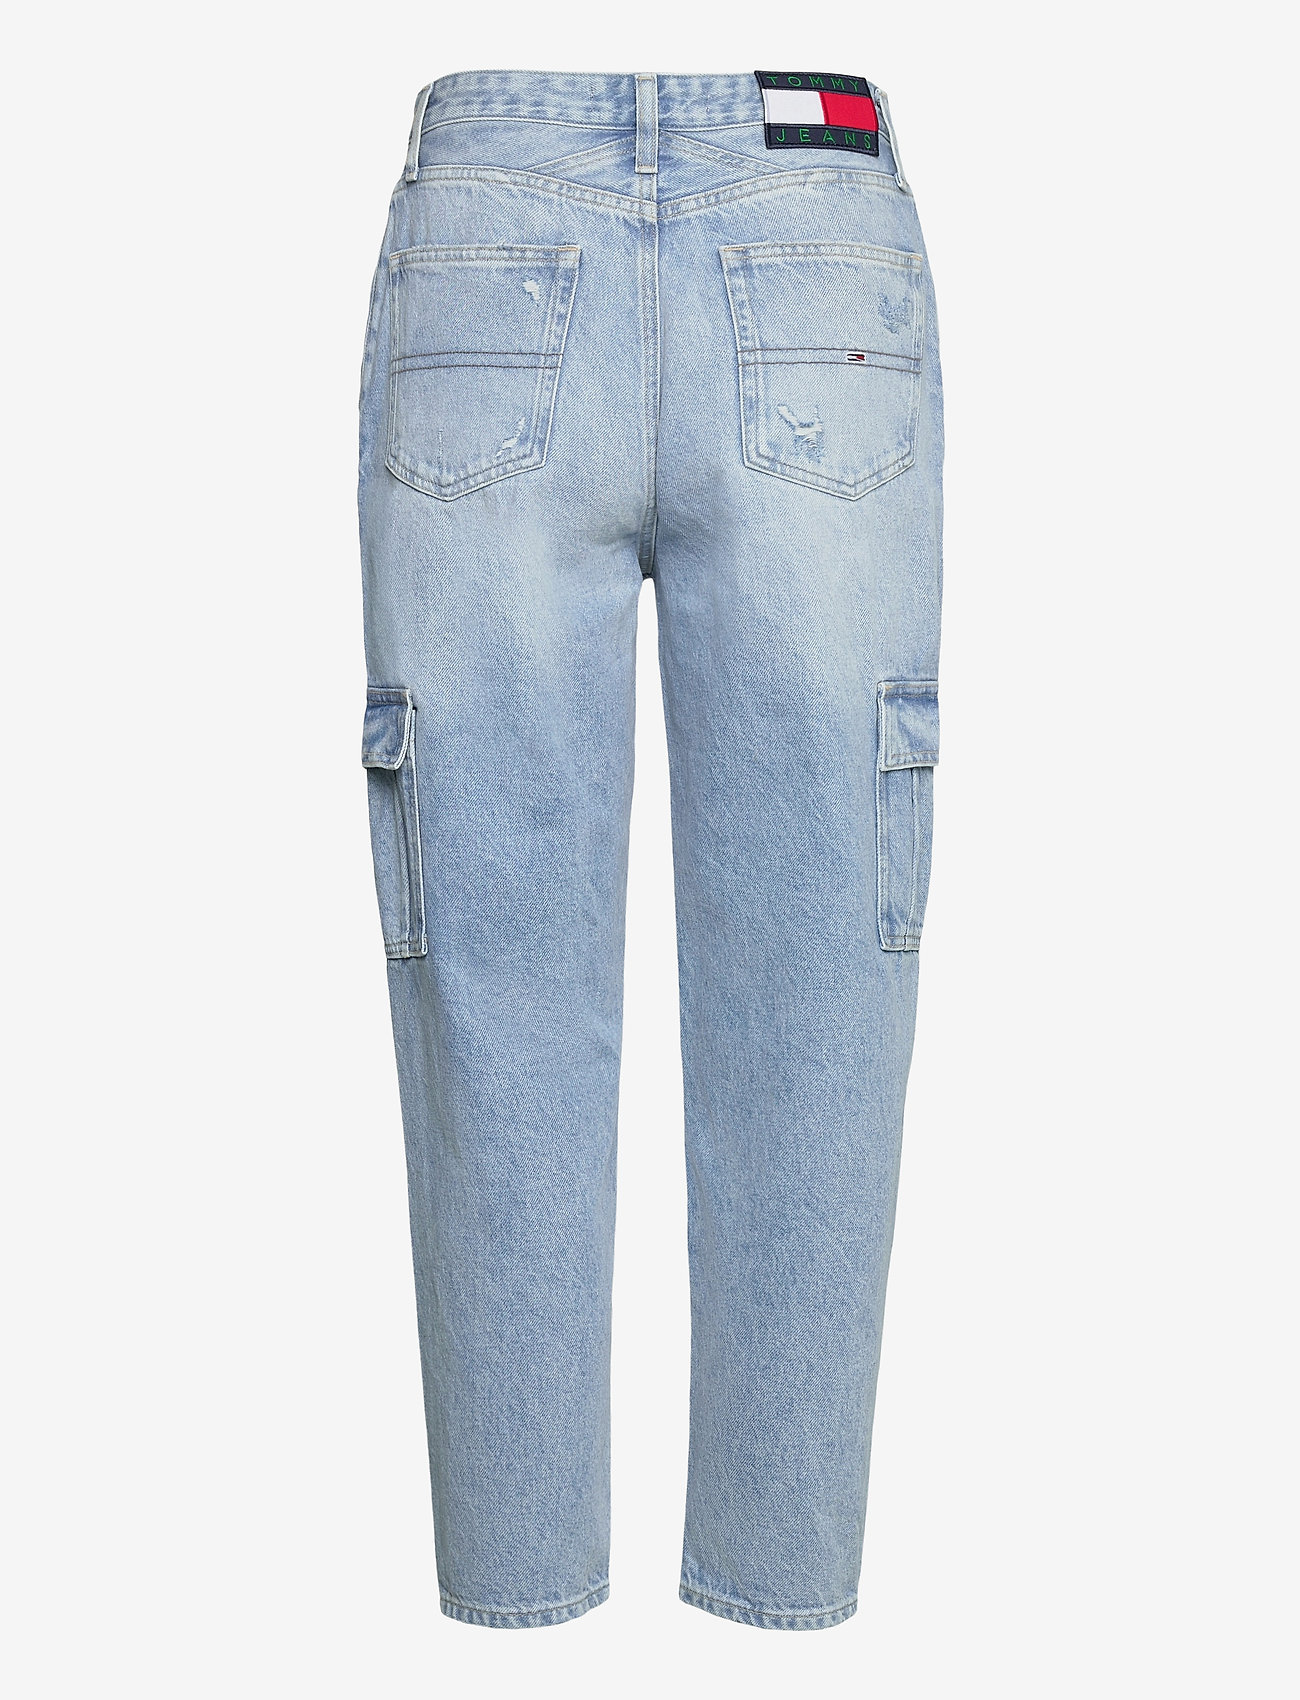 Tommy Jeans - MOM JEAN CARGO SVLBR - mom jeans - save ps lb rig dest - 1